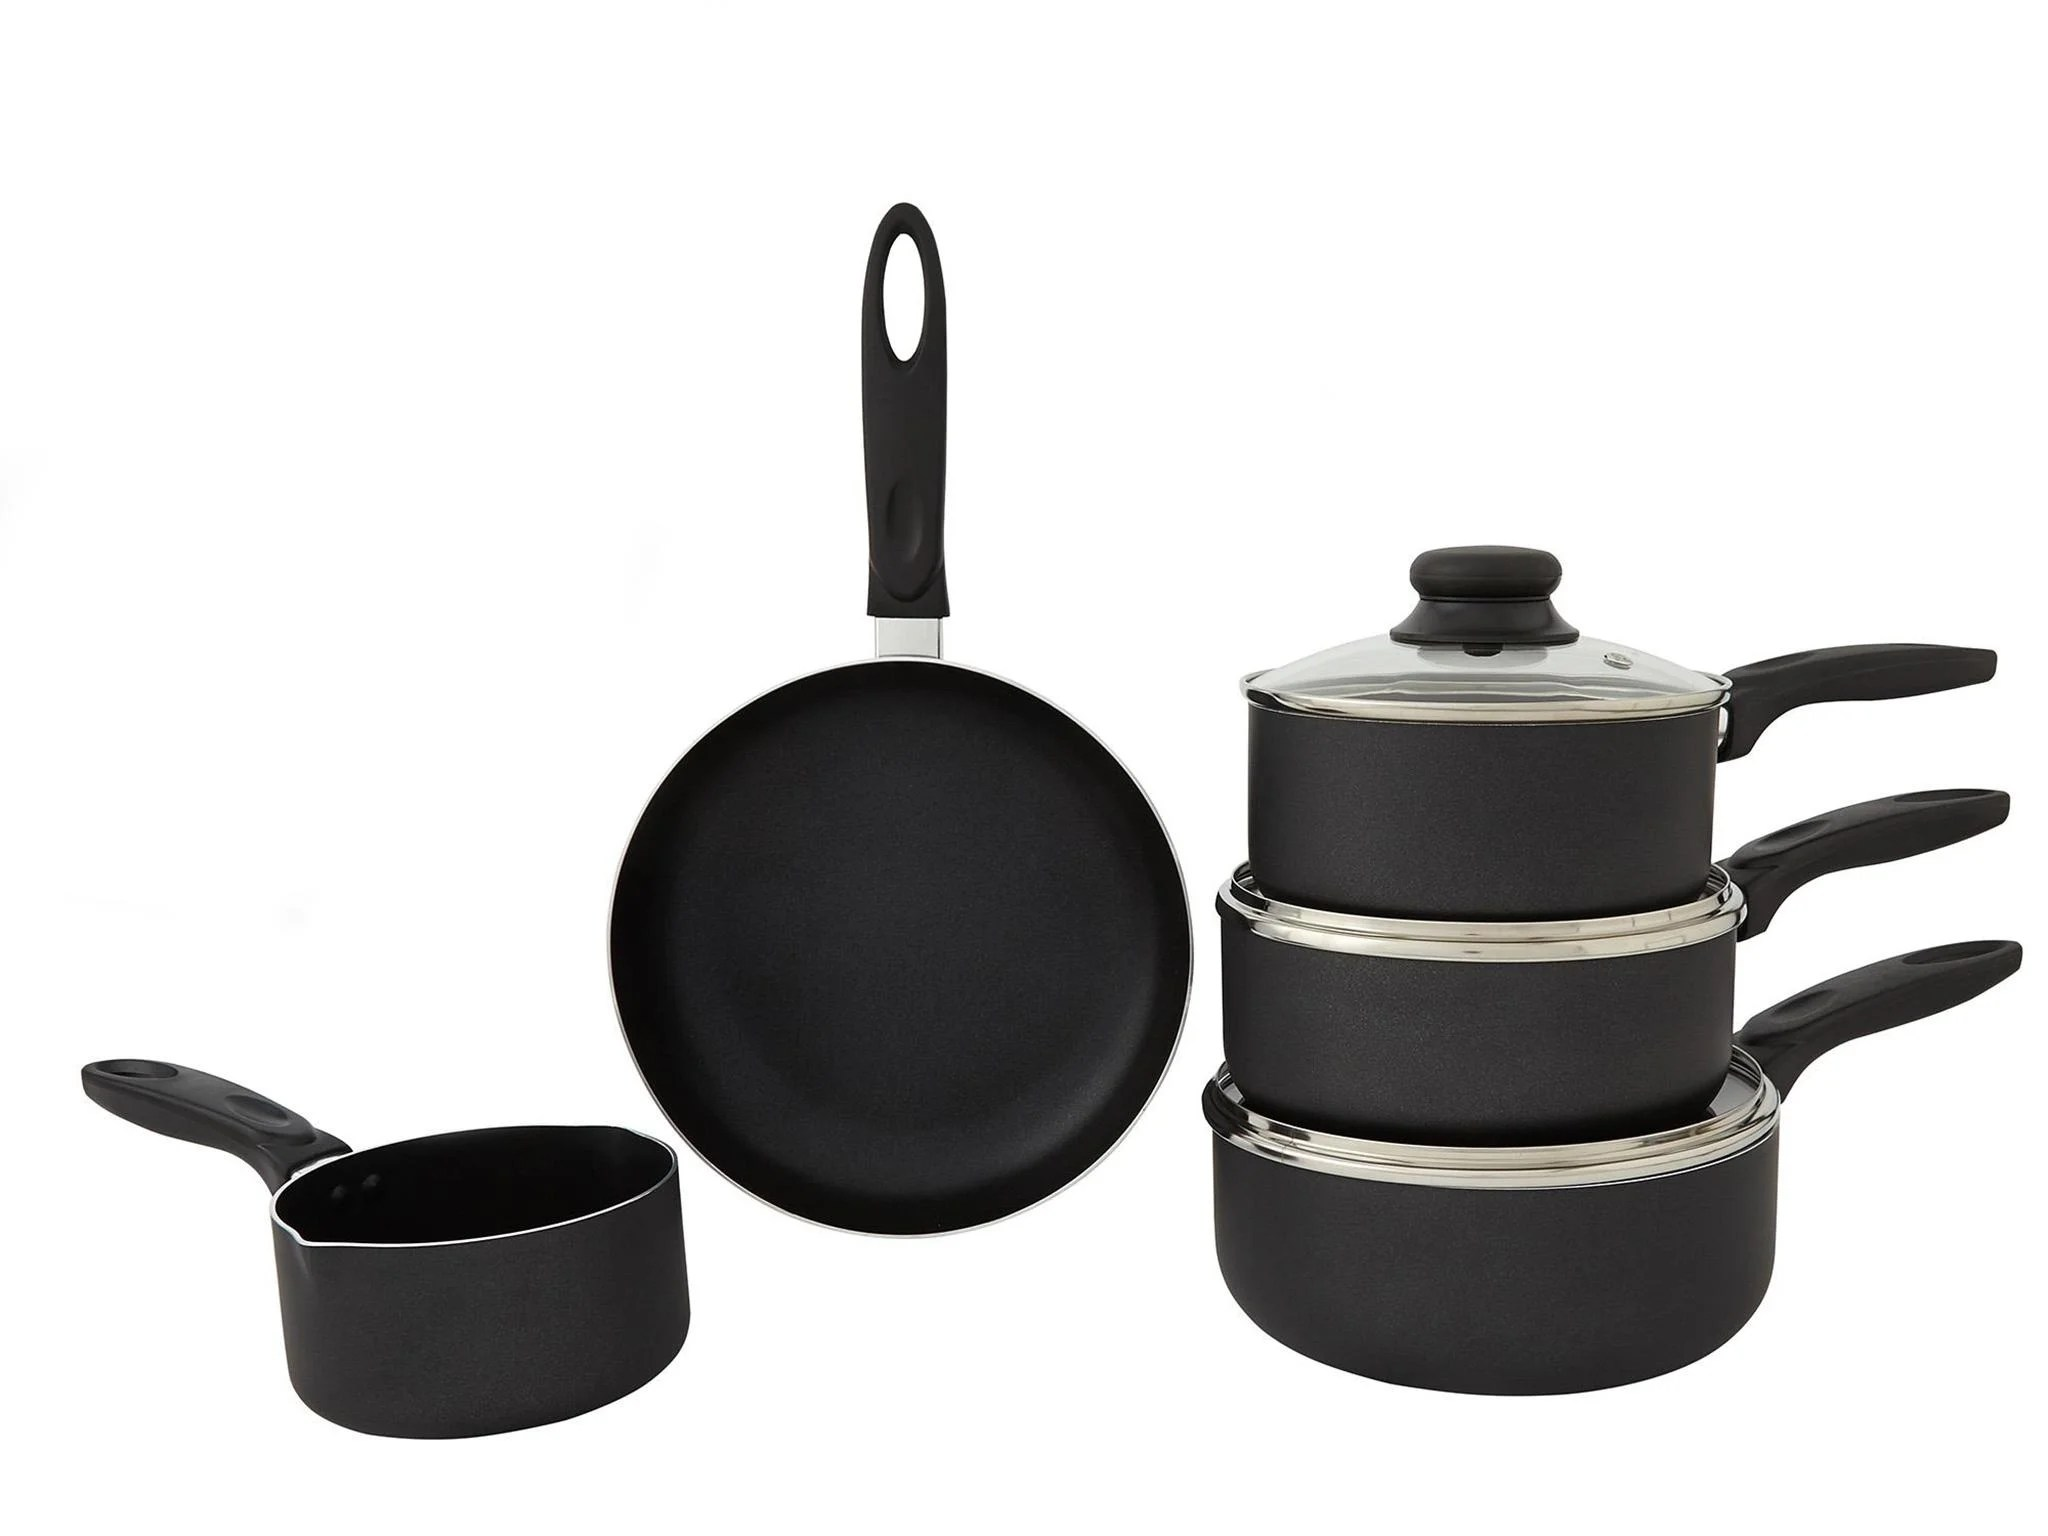 kitchen pan set top faucets 12 best saucepan sets the independent dunelm essentials 5 piece aluminium 30